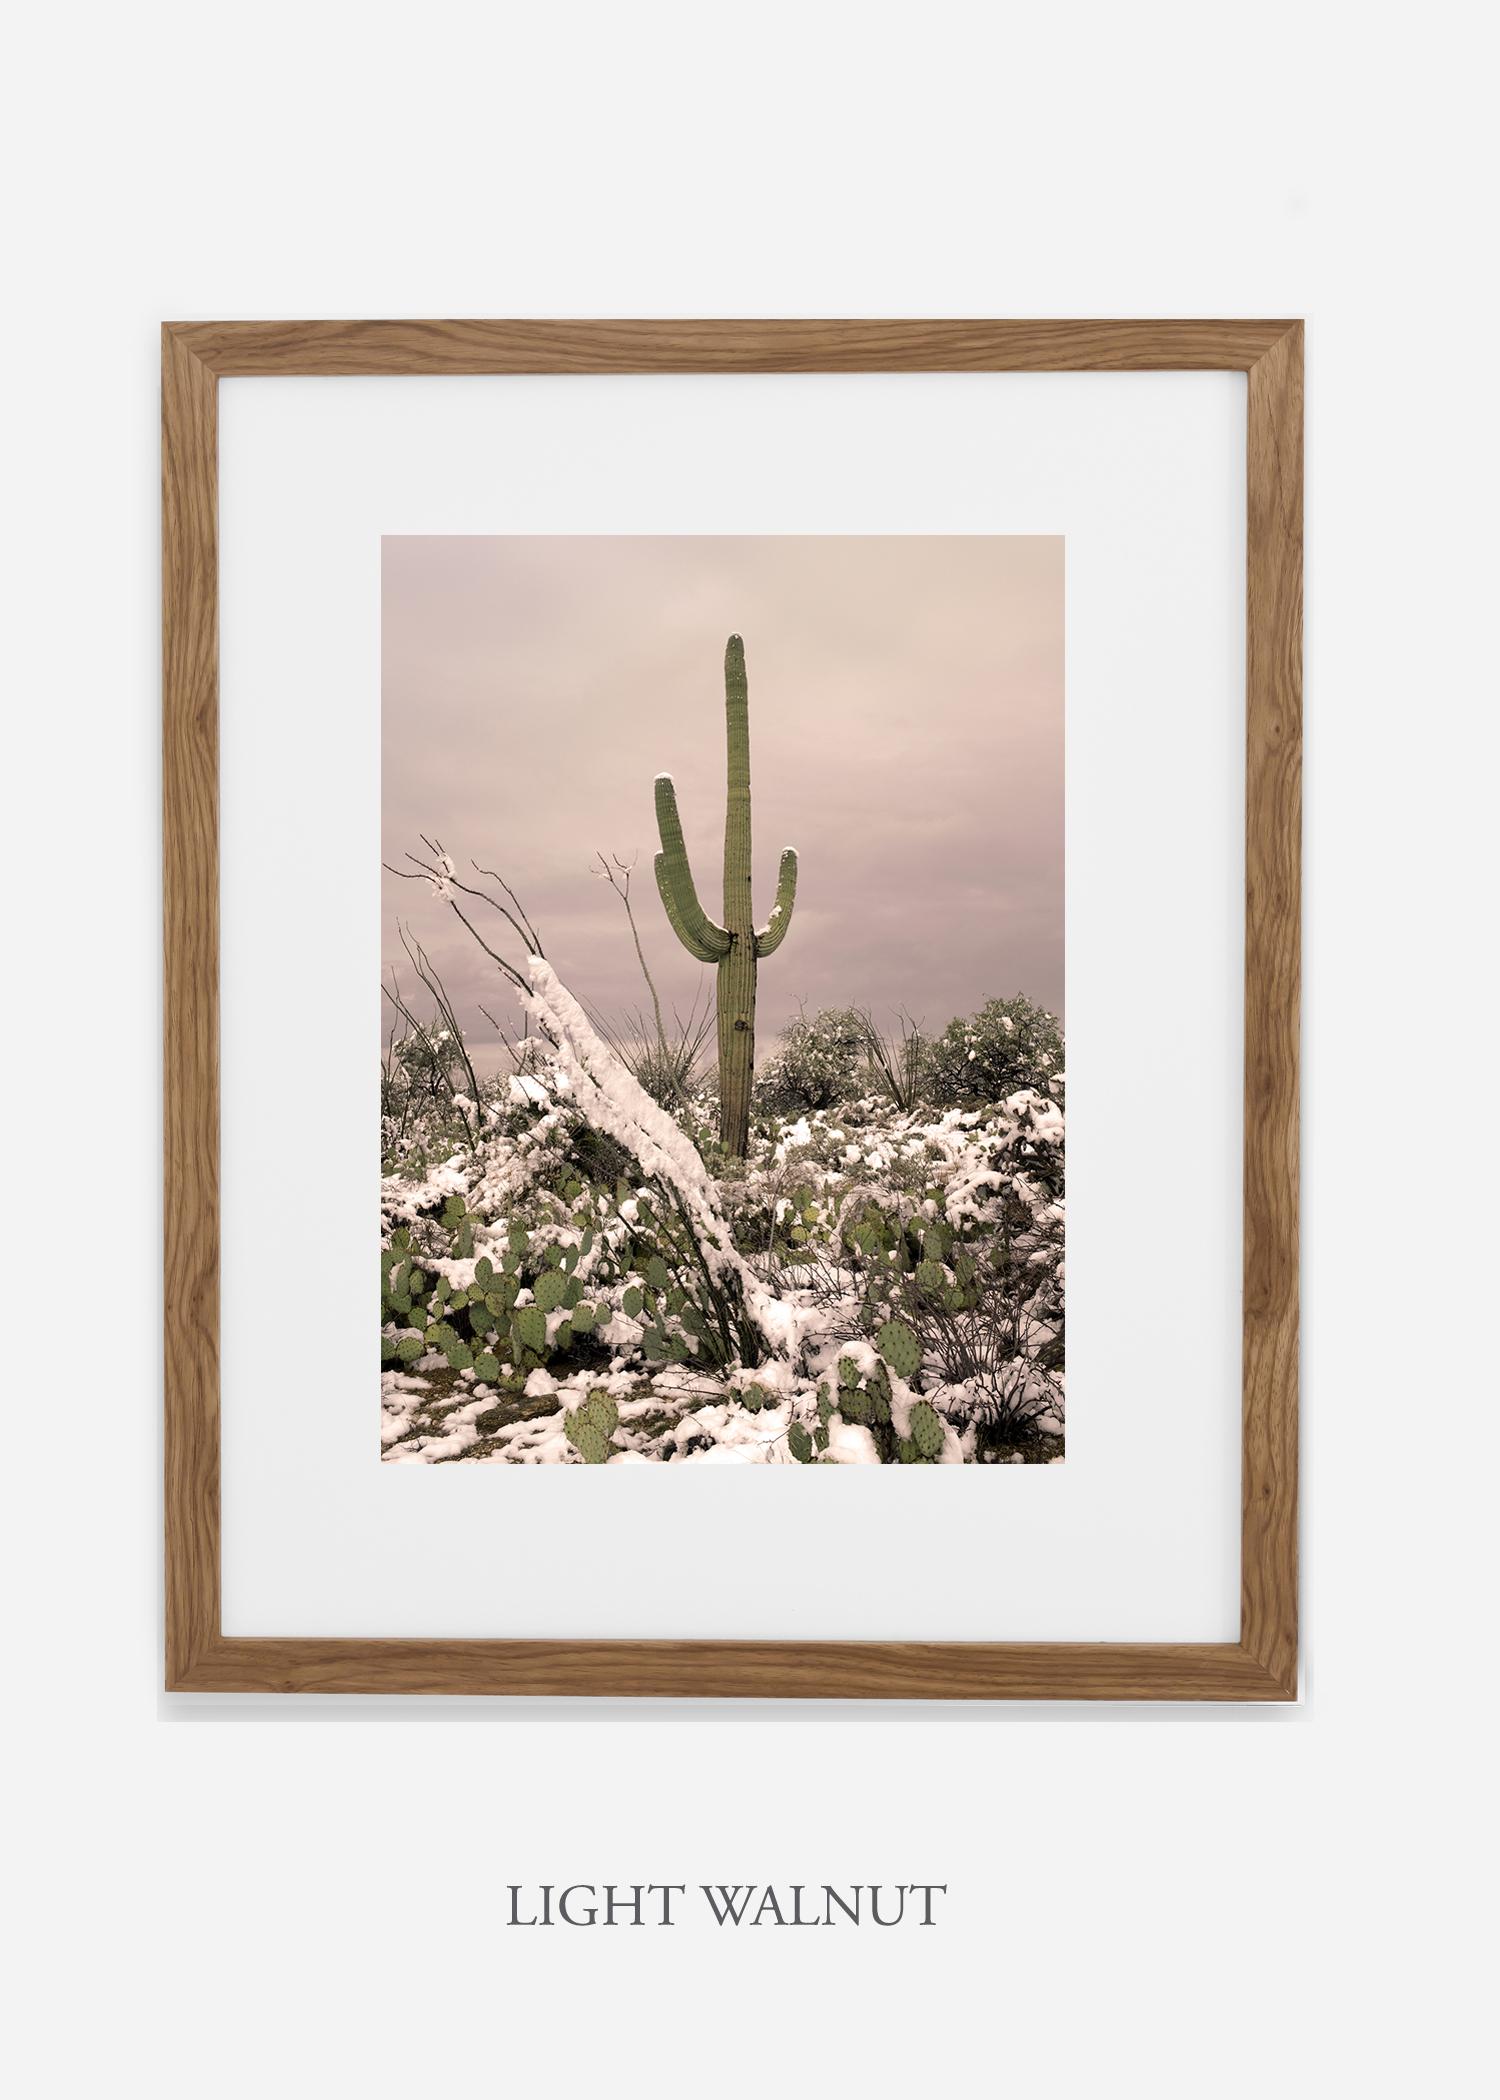 lightwalnutframe-saguaroNo.4-wildercalifornia-art-wallart-cactusprint-homedecor-prints-arizona-botanical-artwork-interiordesign.jpg